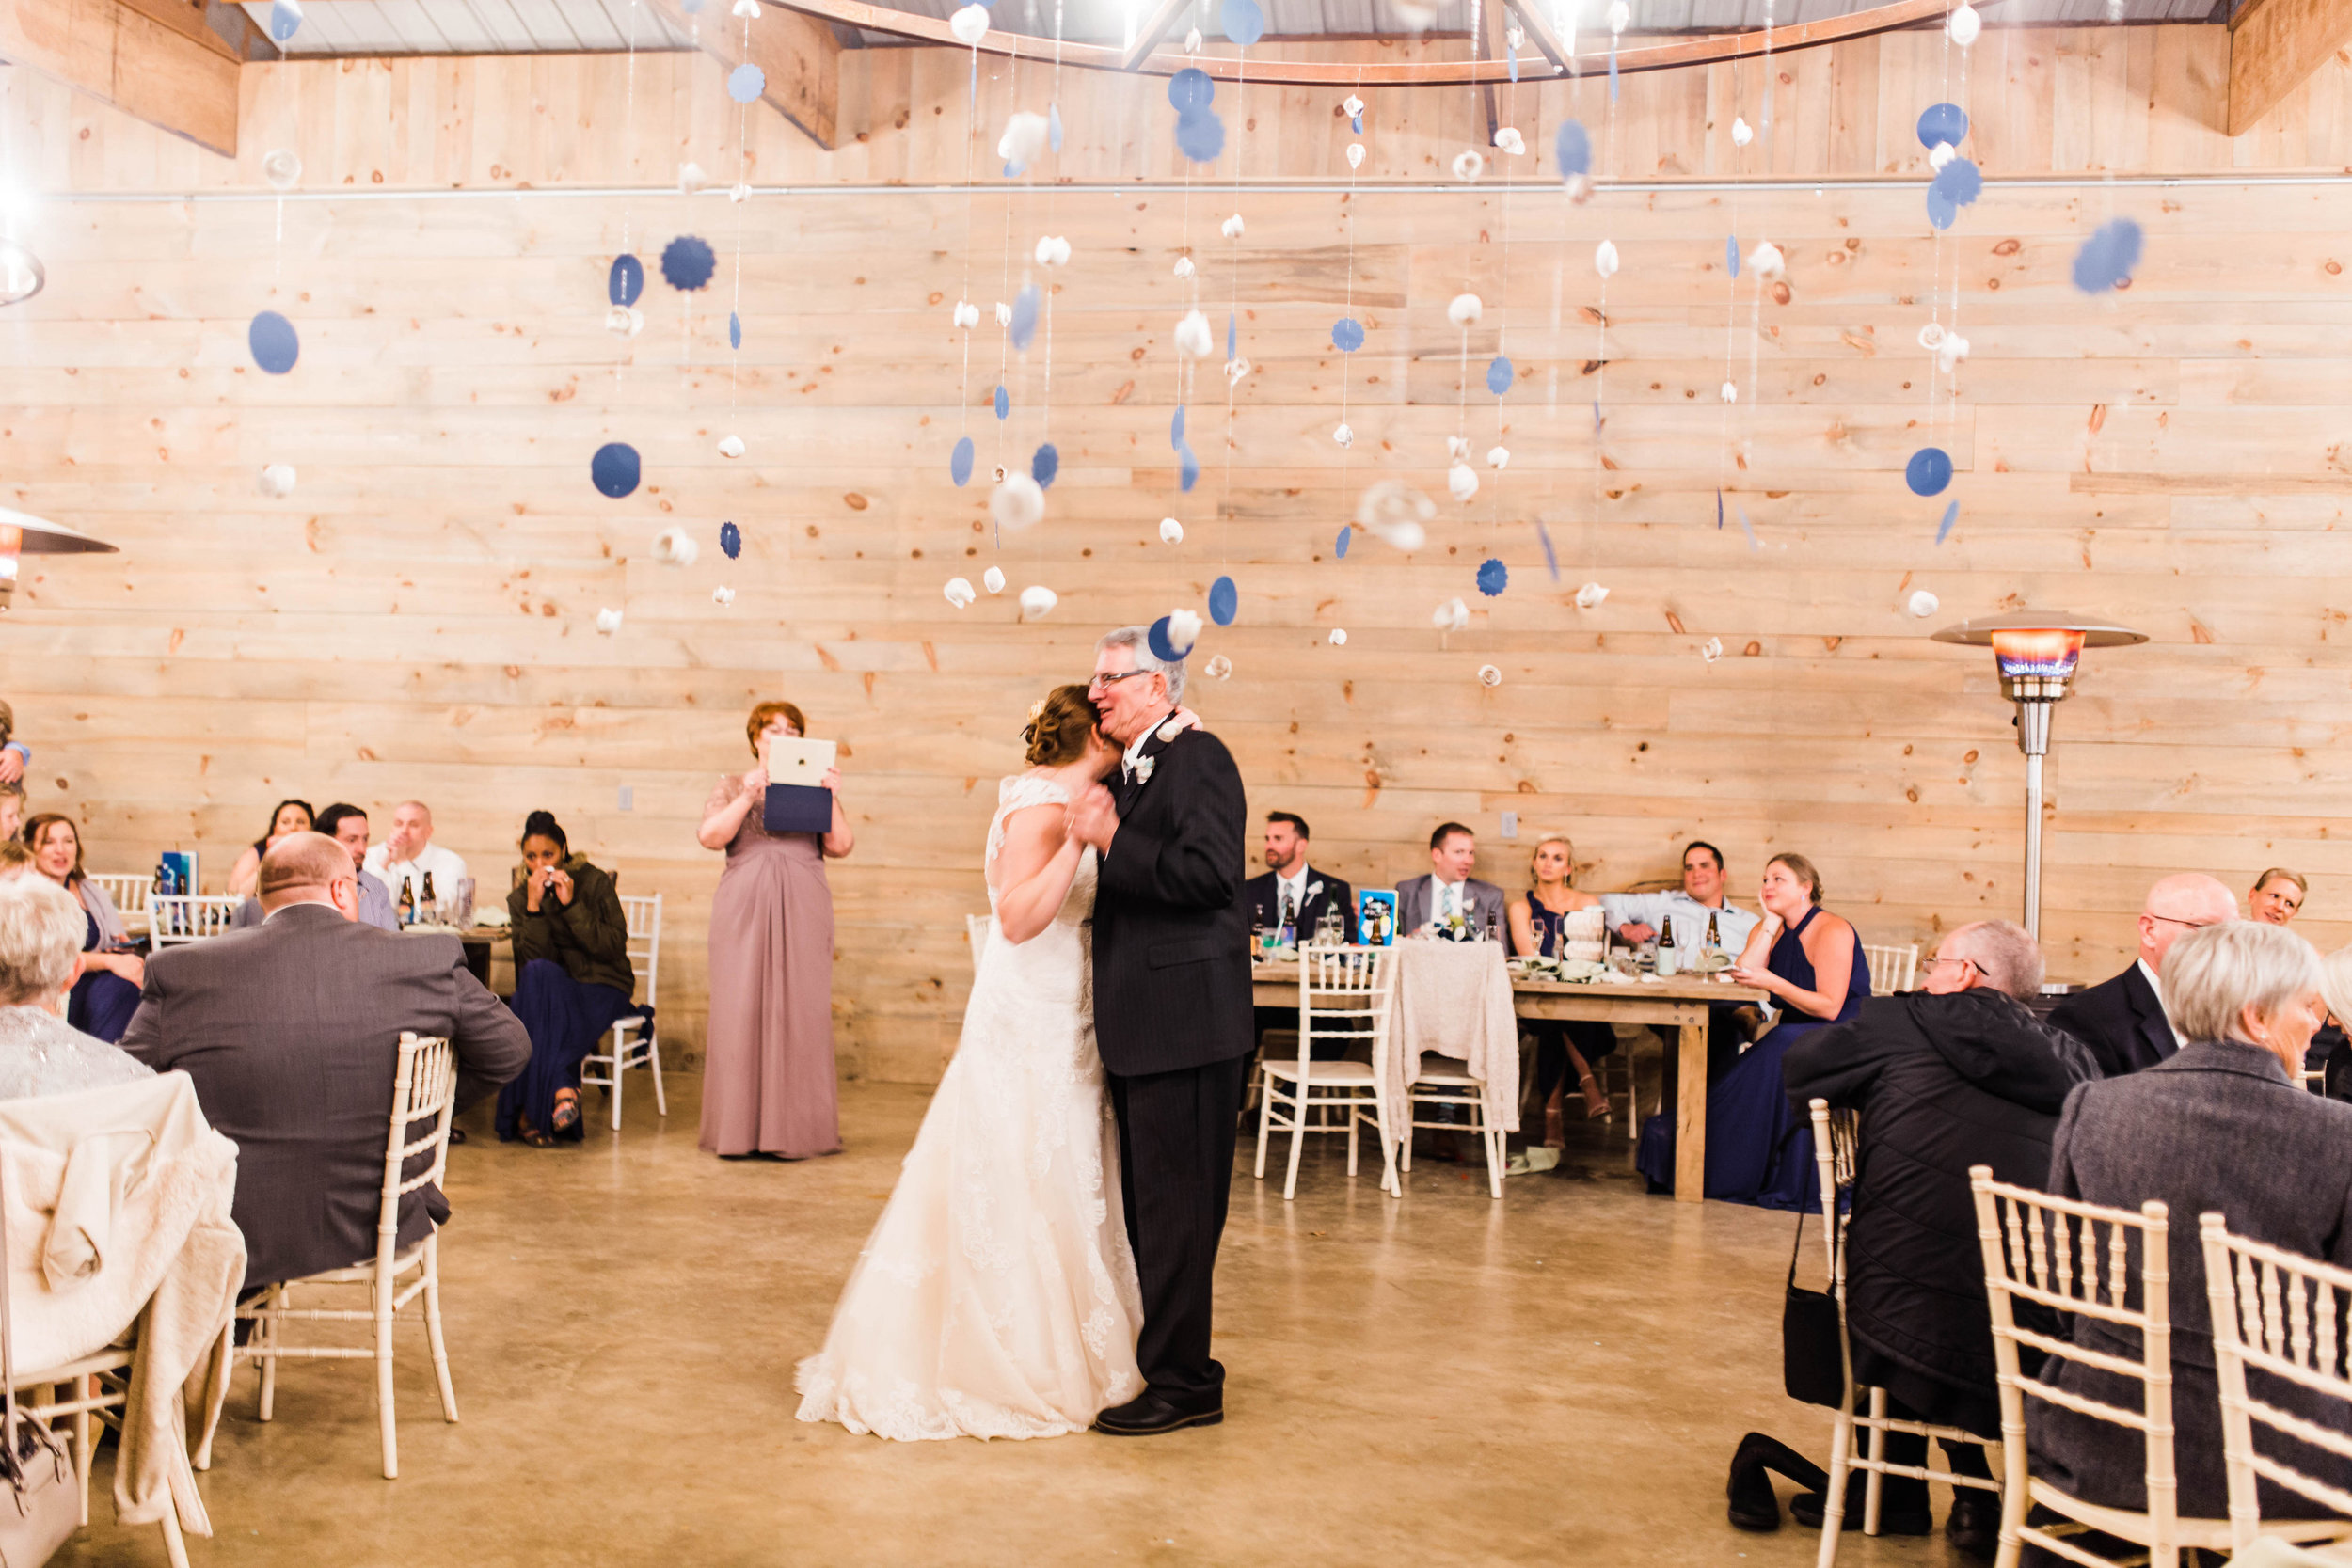 Honeysuckle-Hill-Weddings-Andrew-Rachel-241.jpg